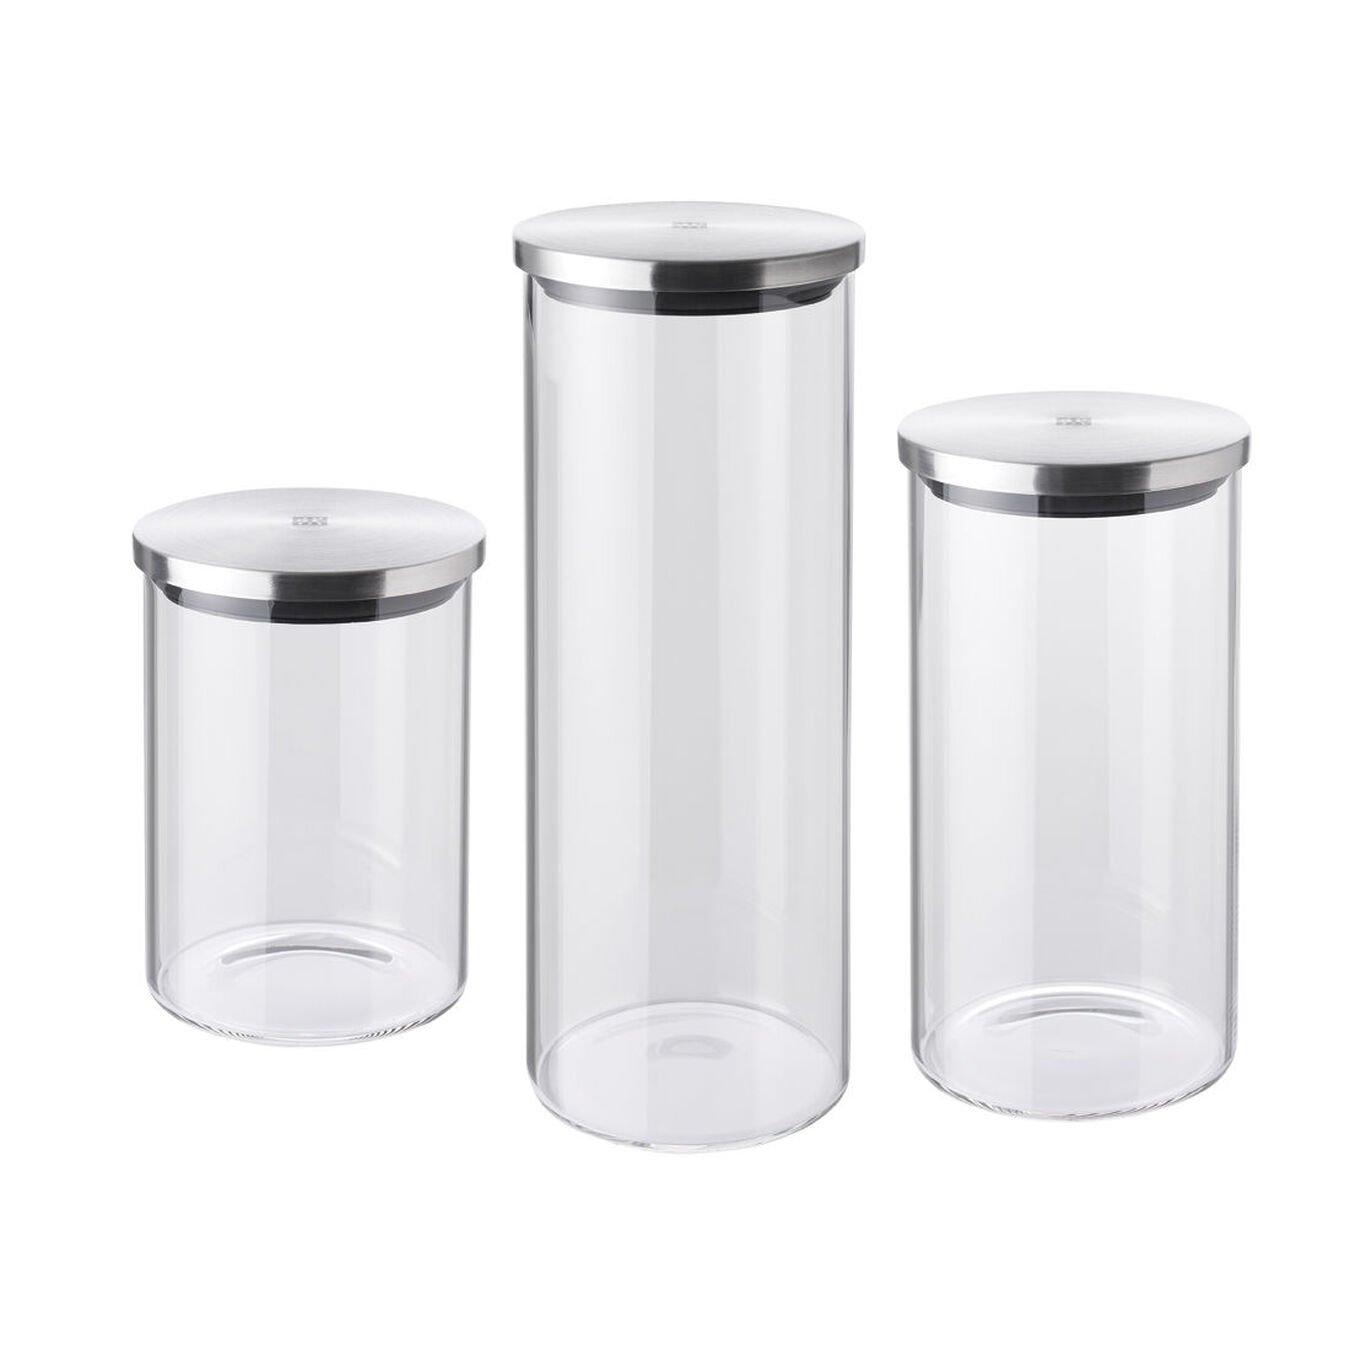 3 Piece Glass Storage Jars, S,M,L,,large 1